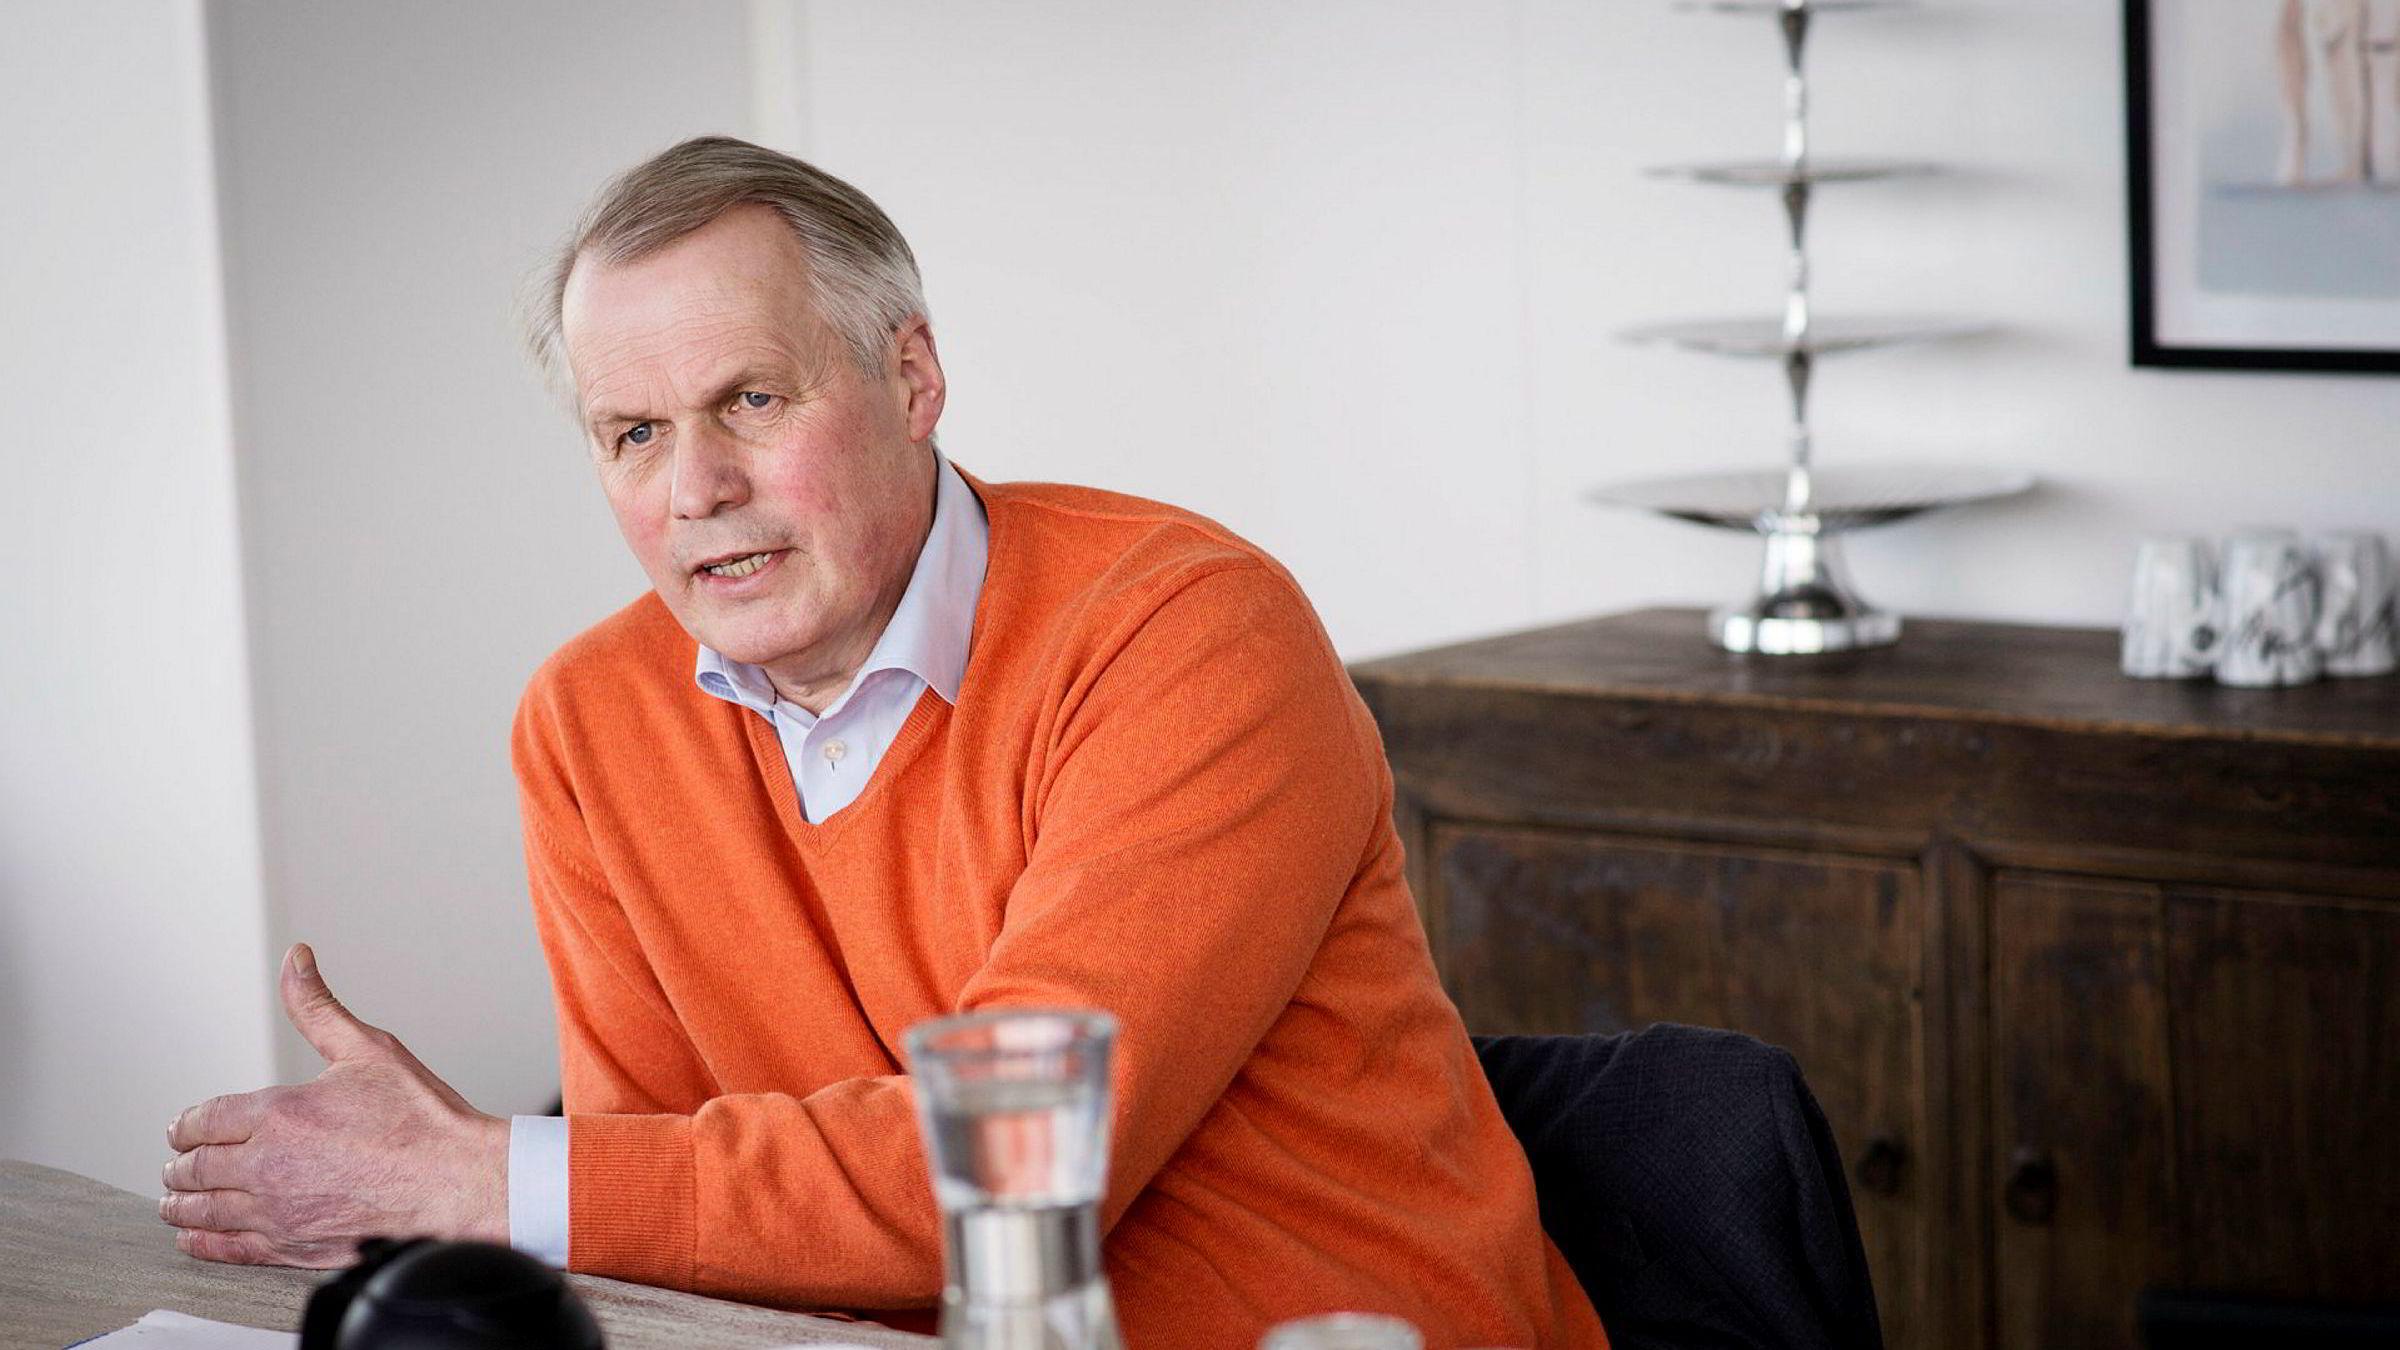 Resultatet i segment Nord-Norge er imidlertid meget svakt, sier Salmar-sjef Gustav Witzøe.